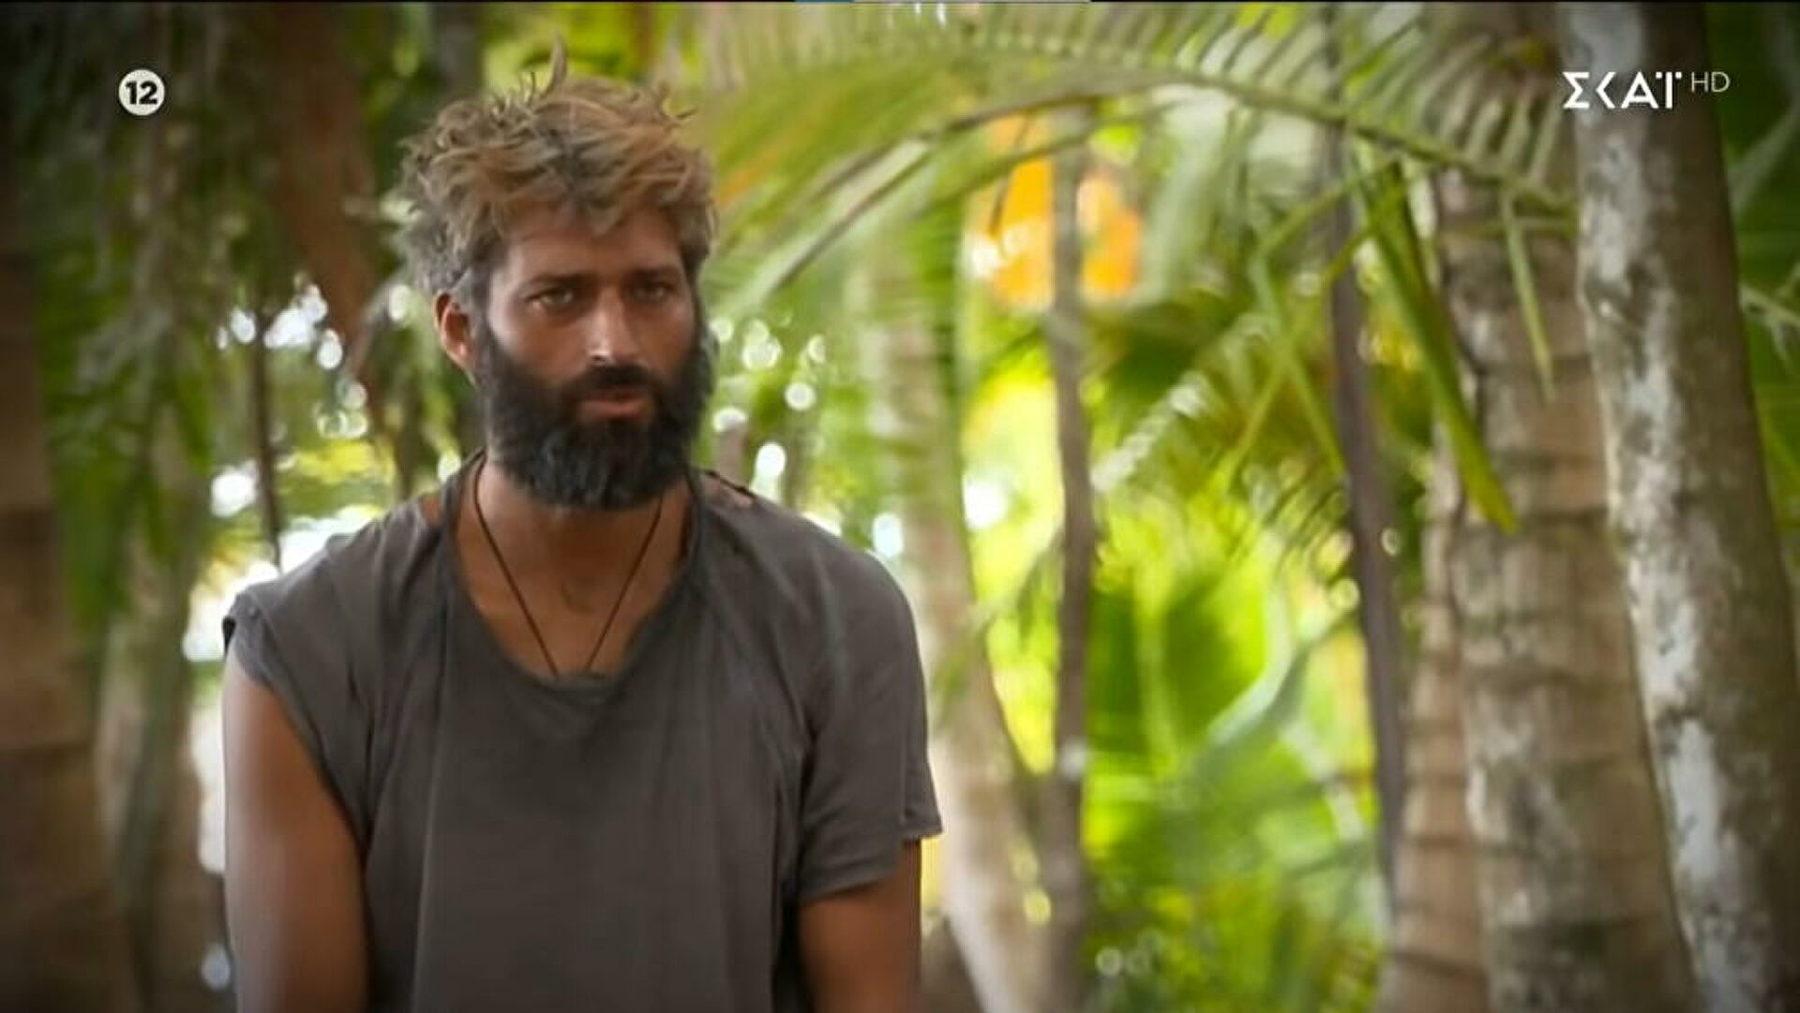 Survivor 4 spoiler: Δυσαρεστημένος με την παραγωγή ο Αλέξης Παππάς - «Με βάζετε να κάνω τον κακό ενώ δεν είμαι»